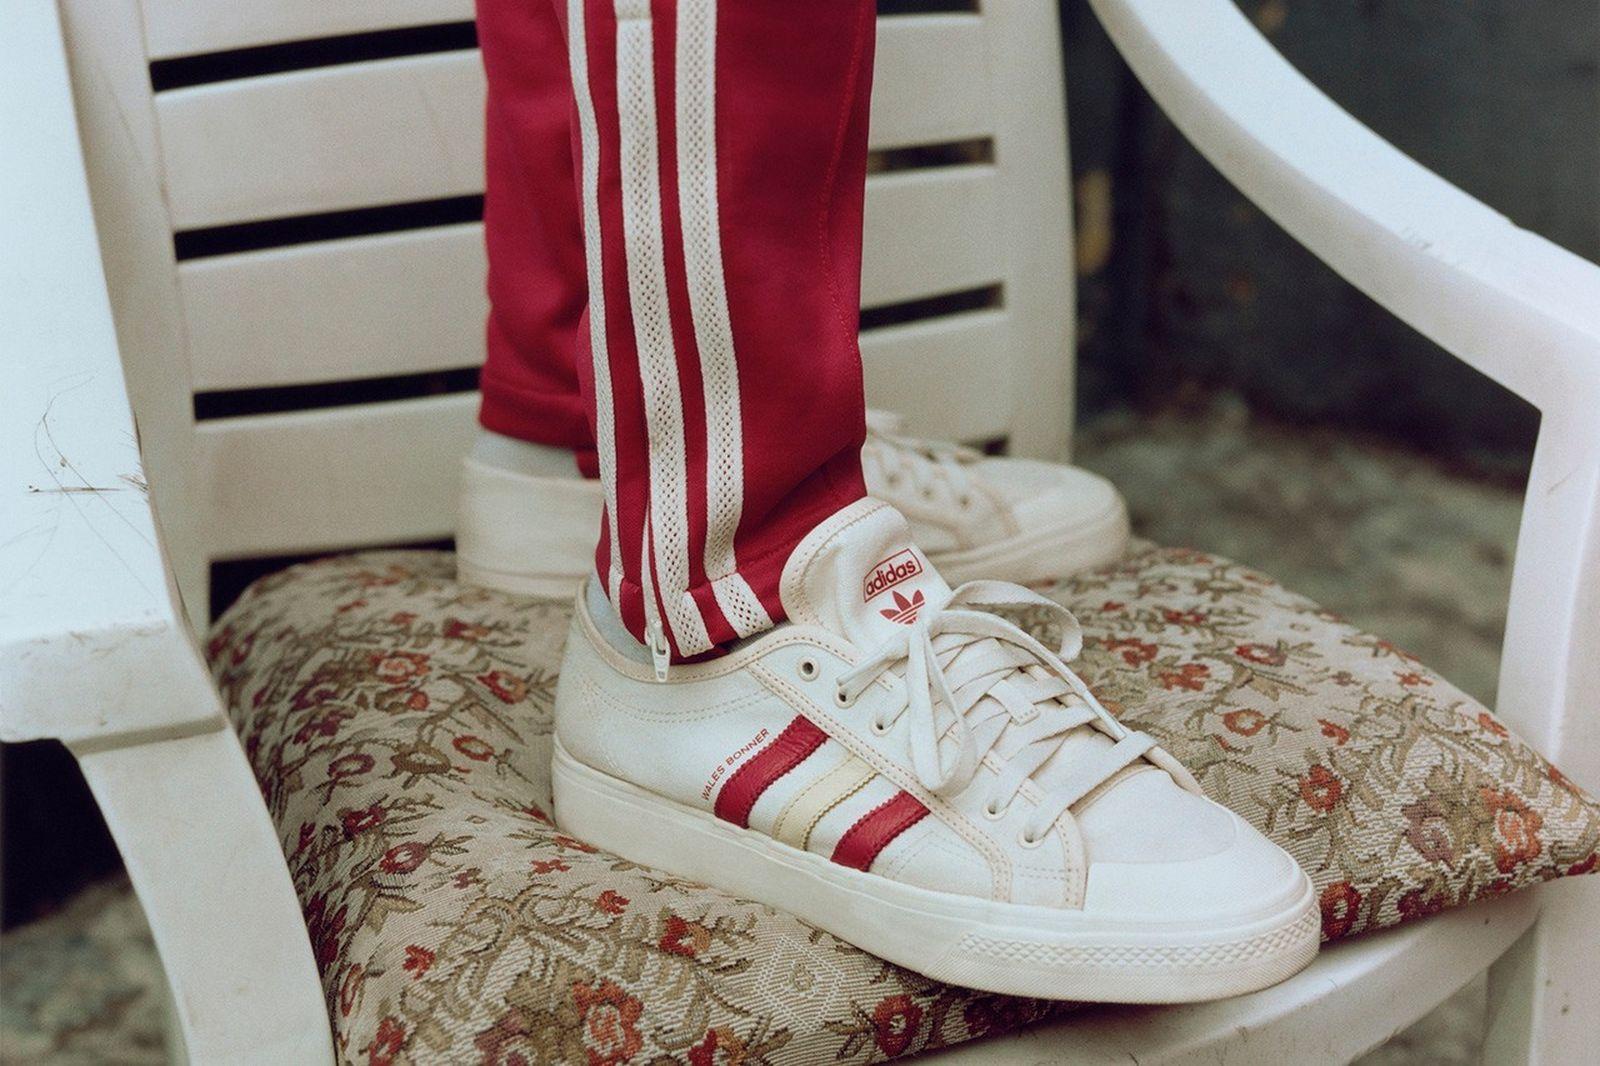 grace-wales-bonner-x-adidas-6